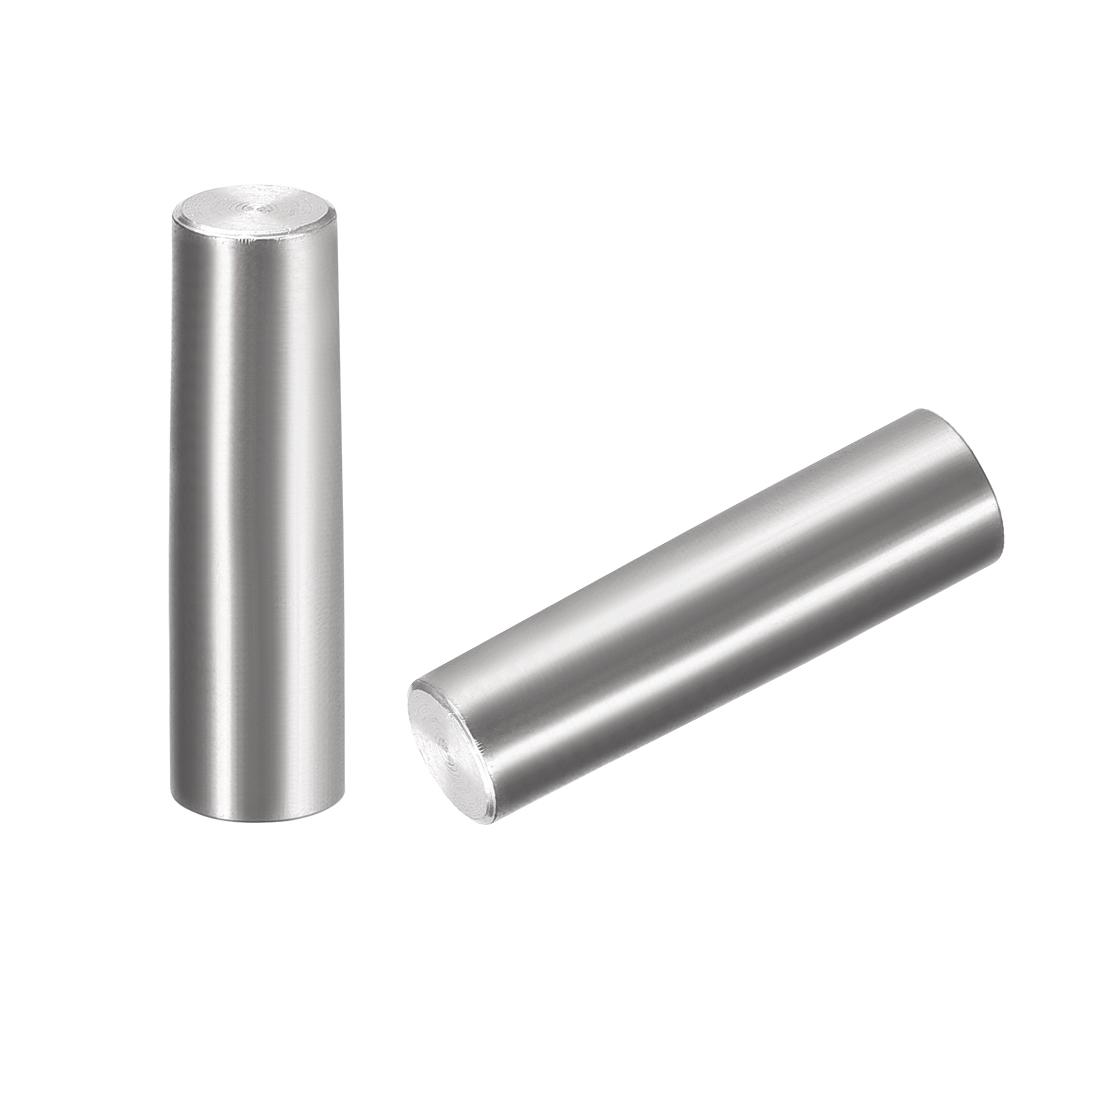 2Pcs 8mm x 30mm 1:50 Taper Pin 304 Stainless Steel Shelf Support Pin Fasten